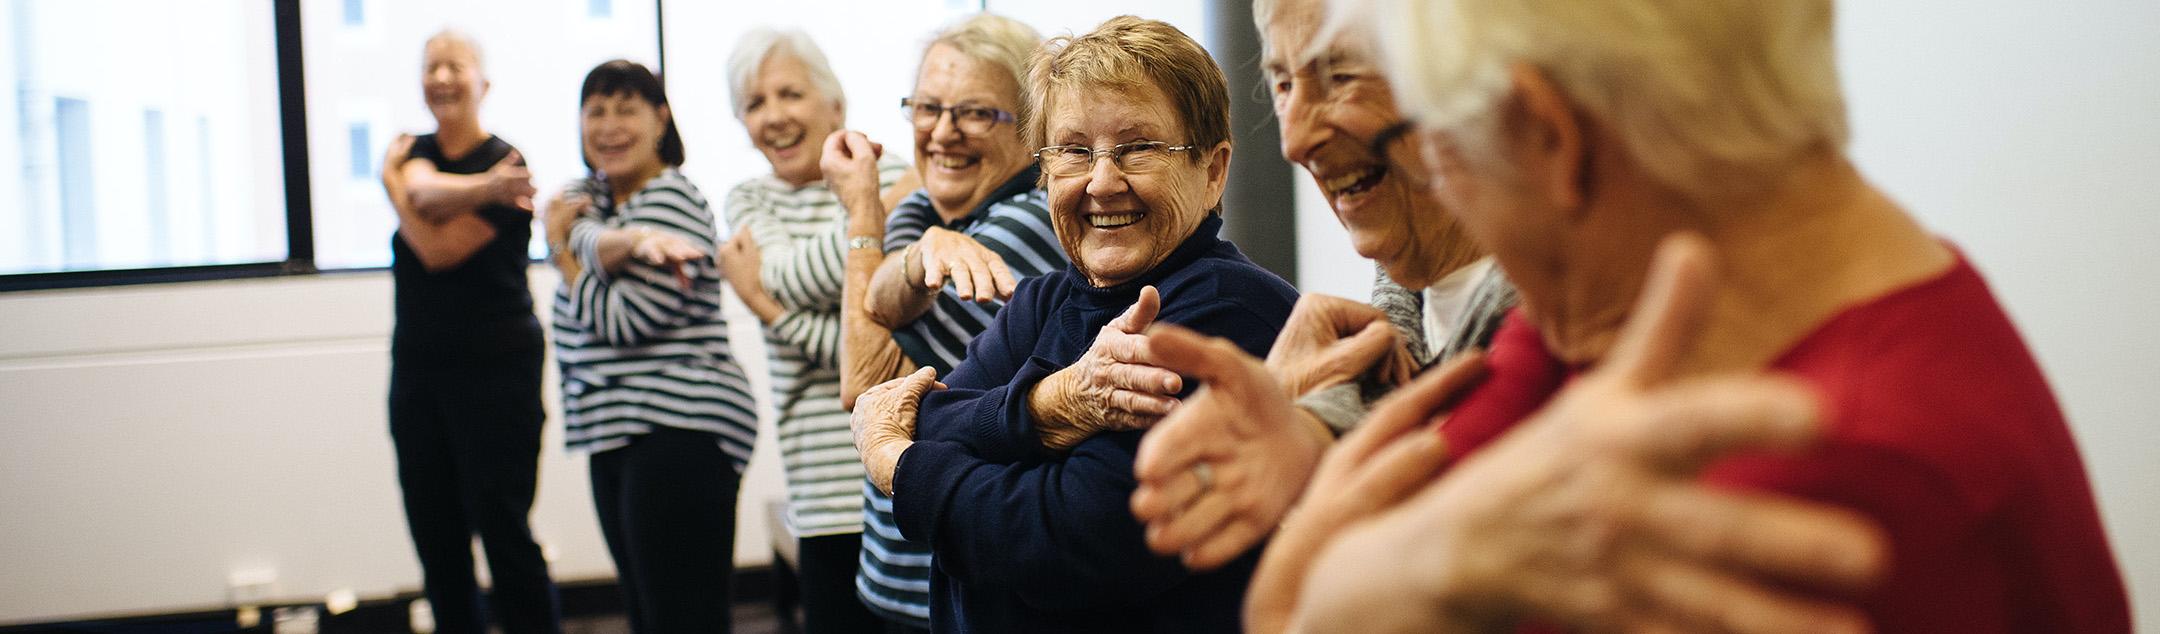 over 60 seniors exercise class newcastle